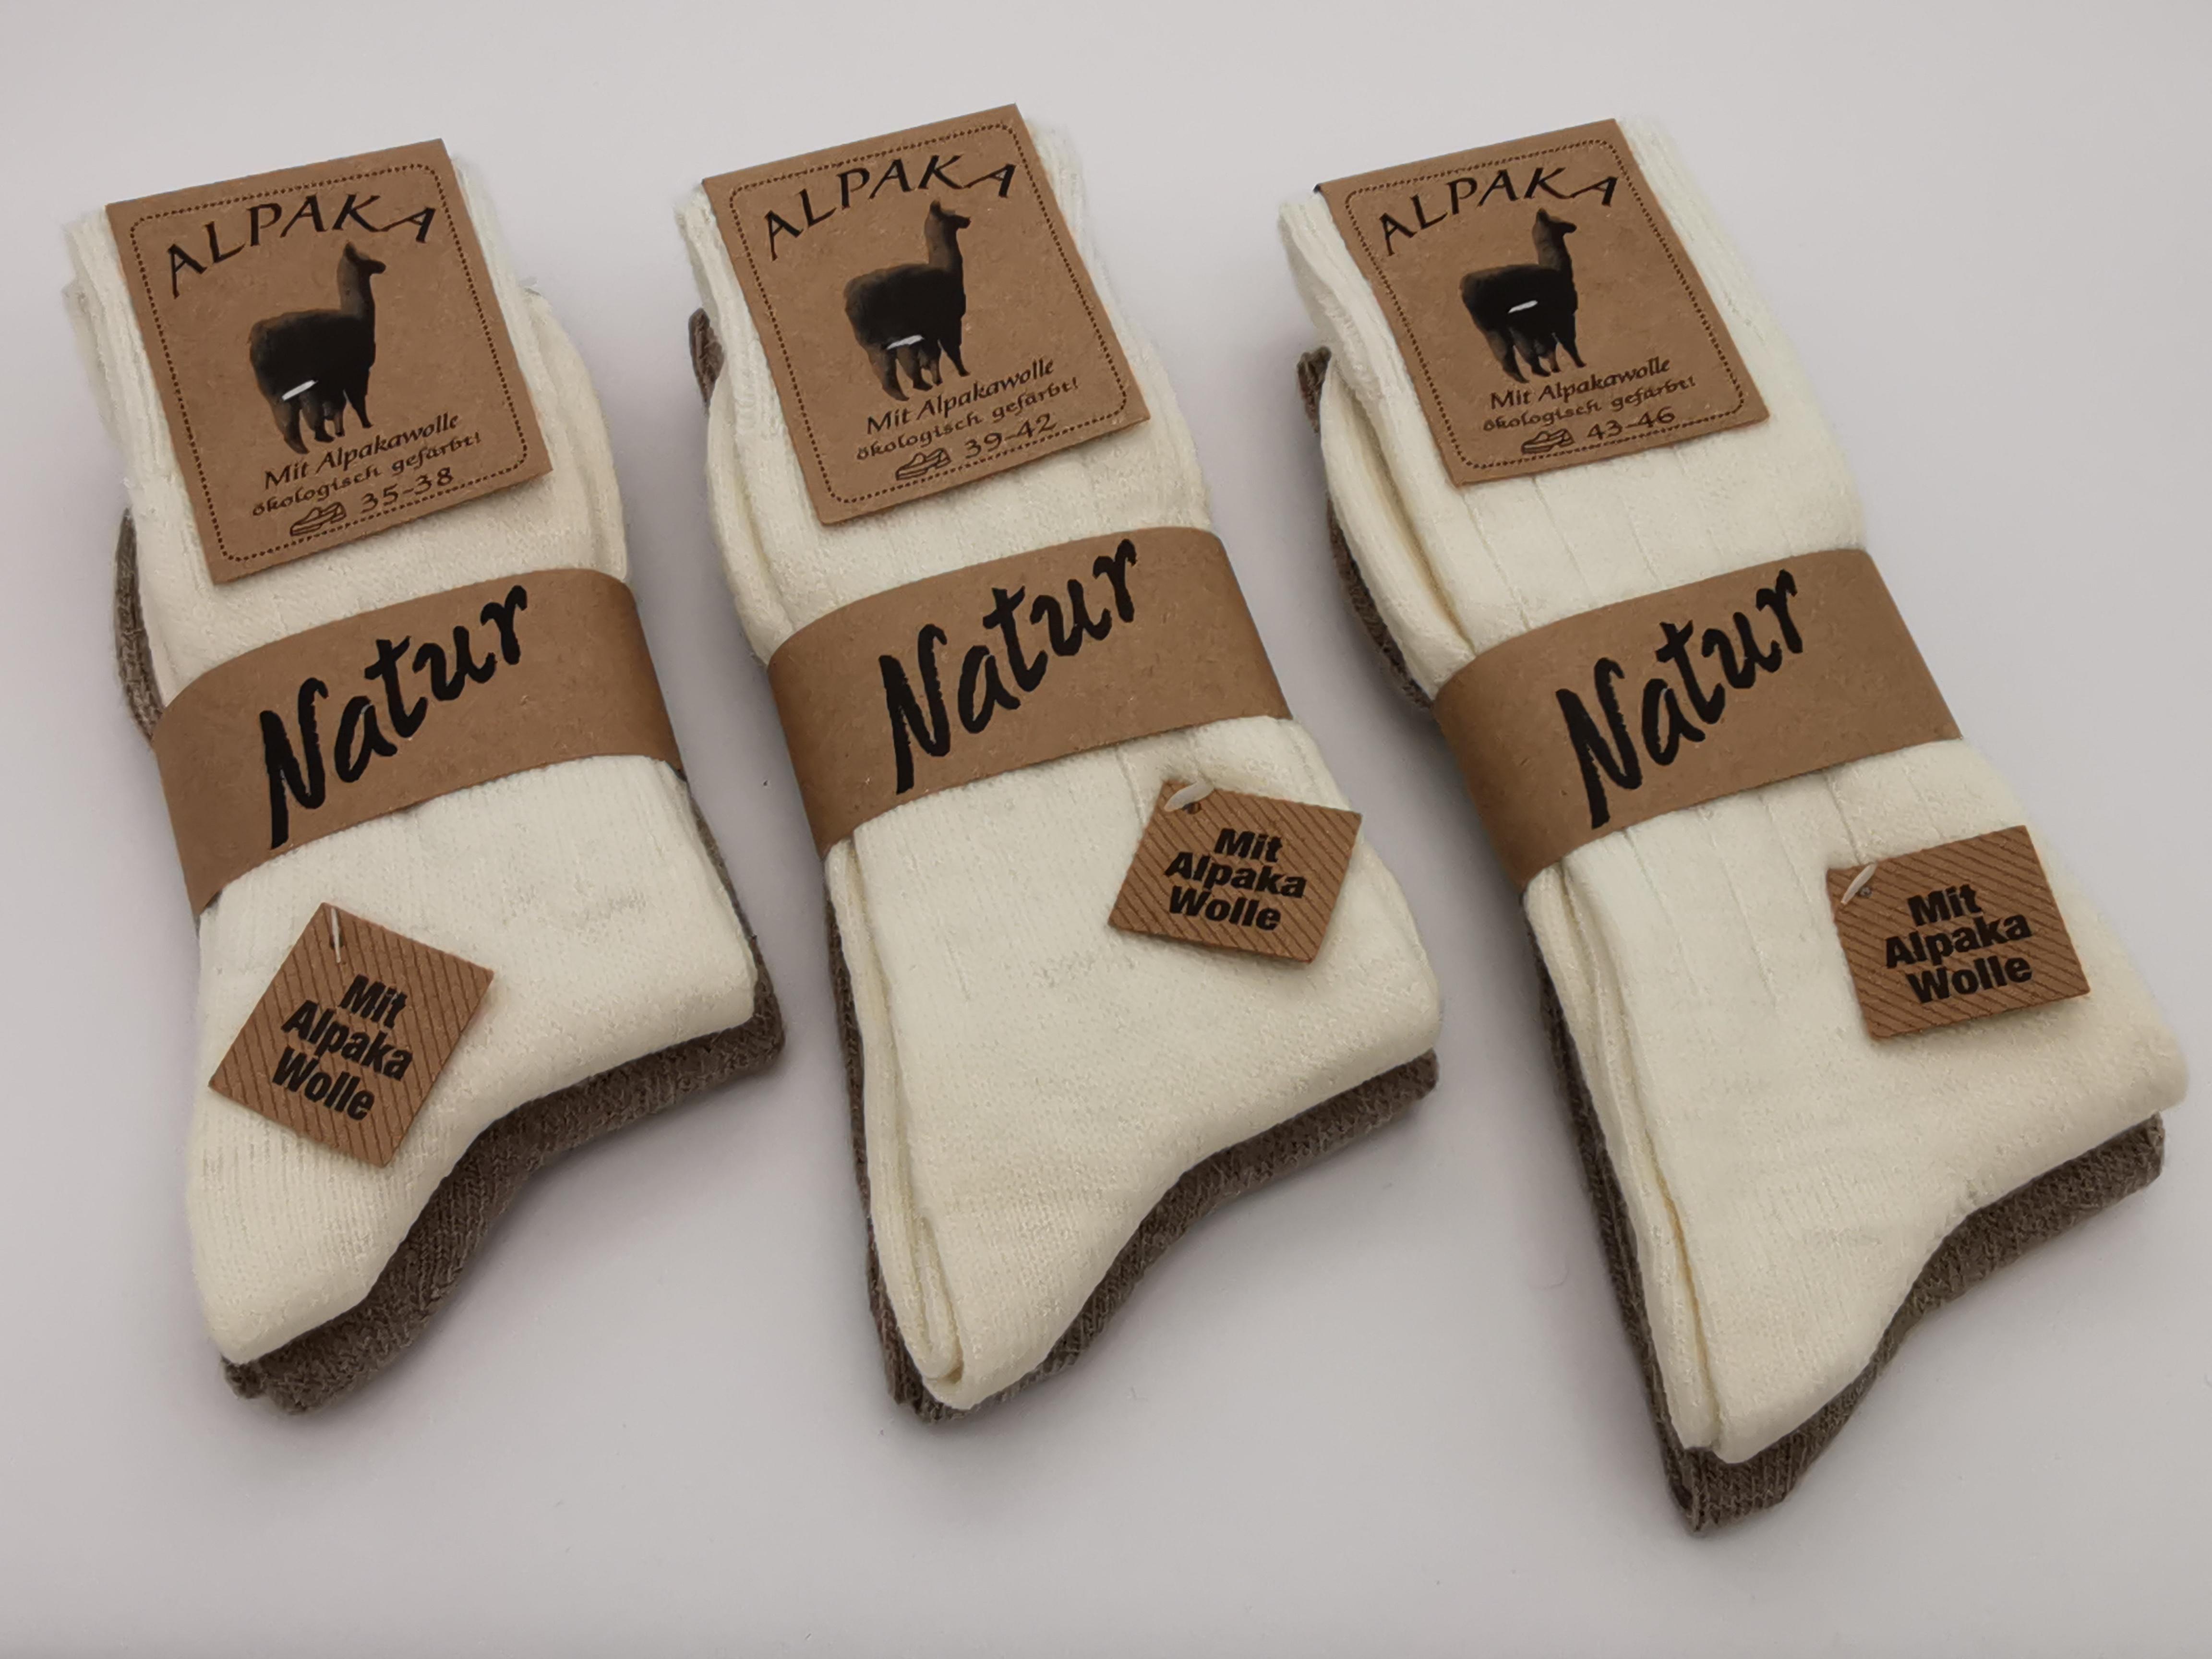 2 Paar Alpaka-Socken fein gestrickt